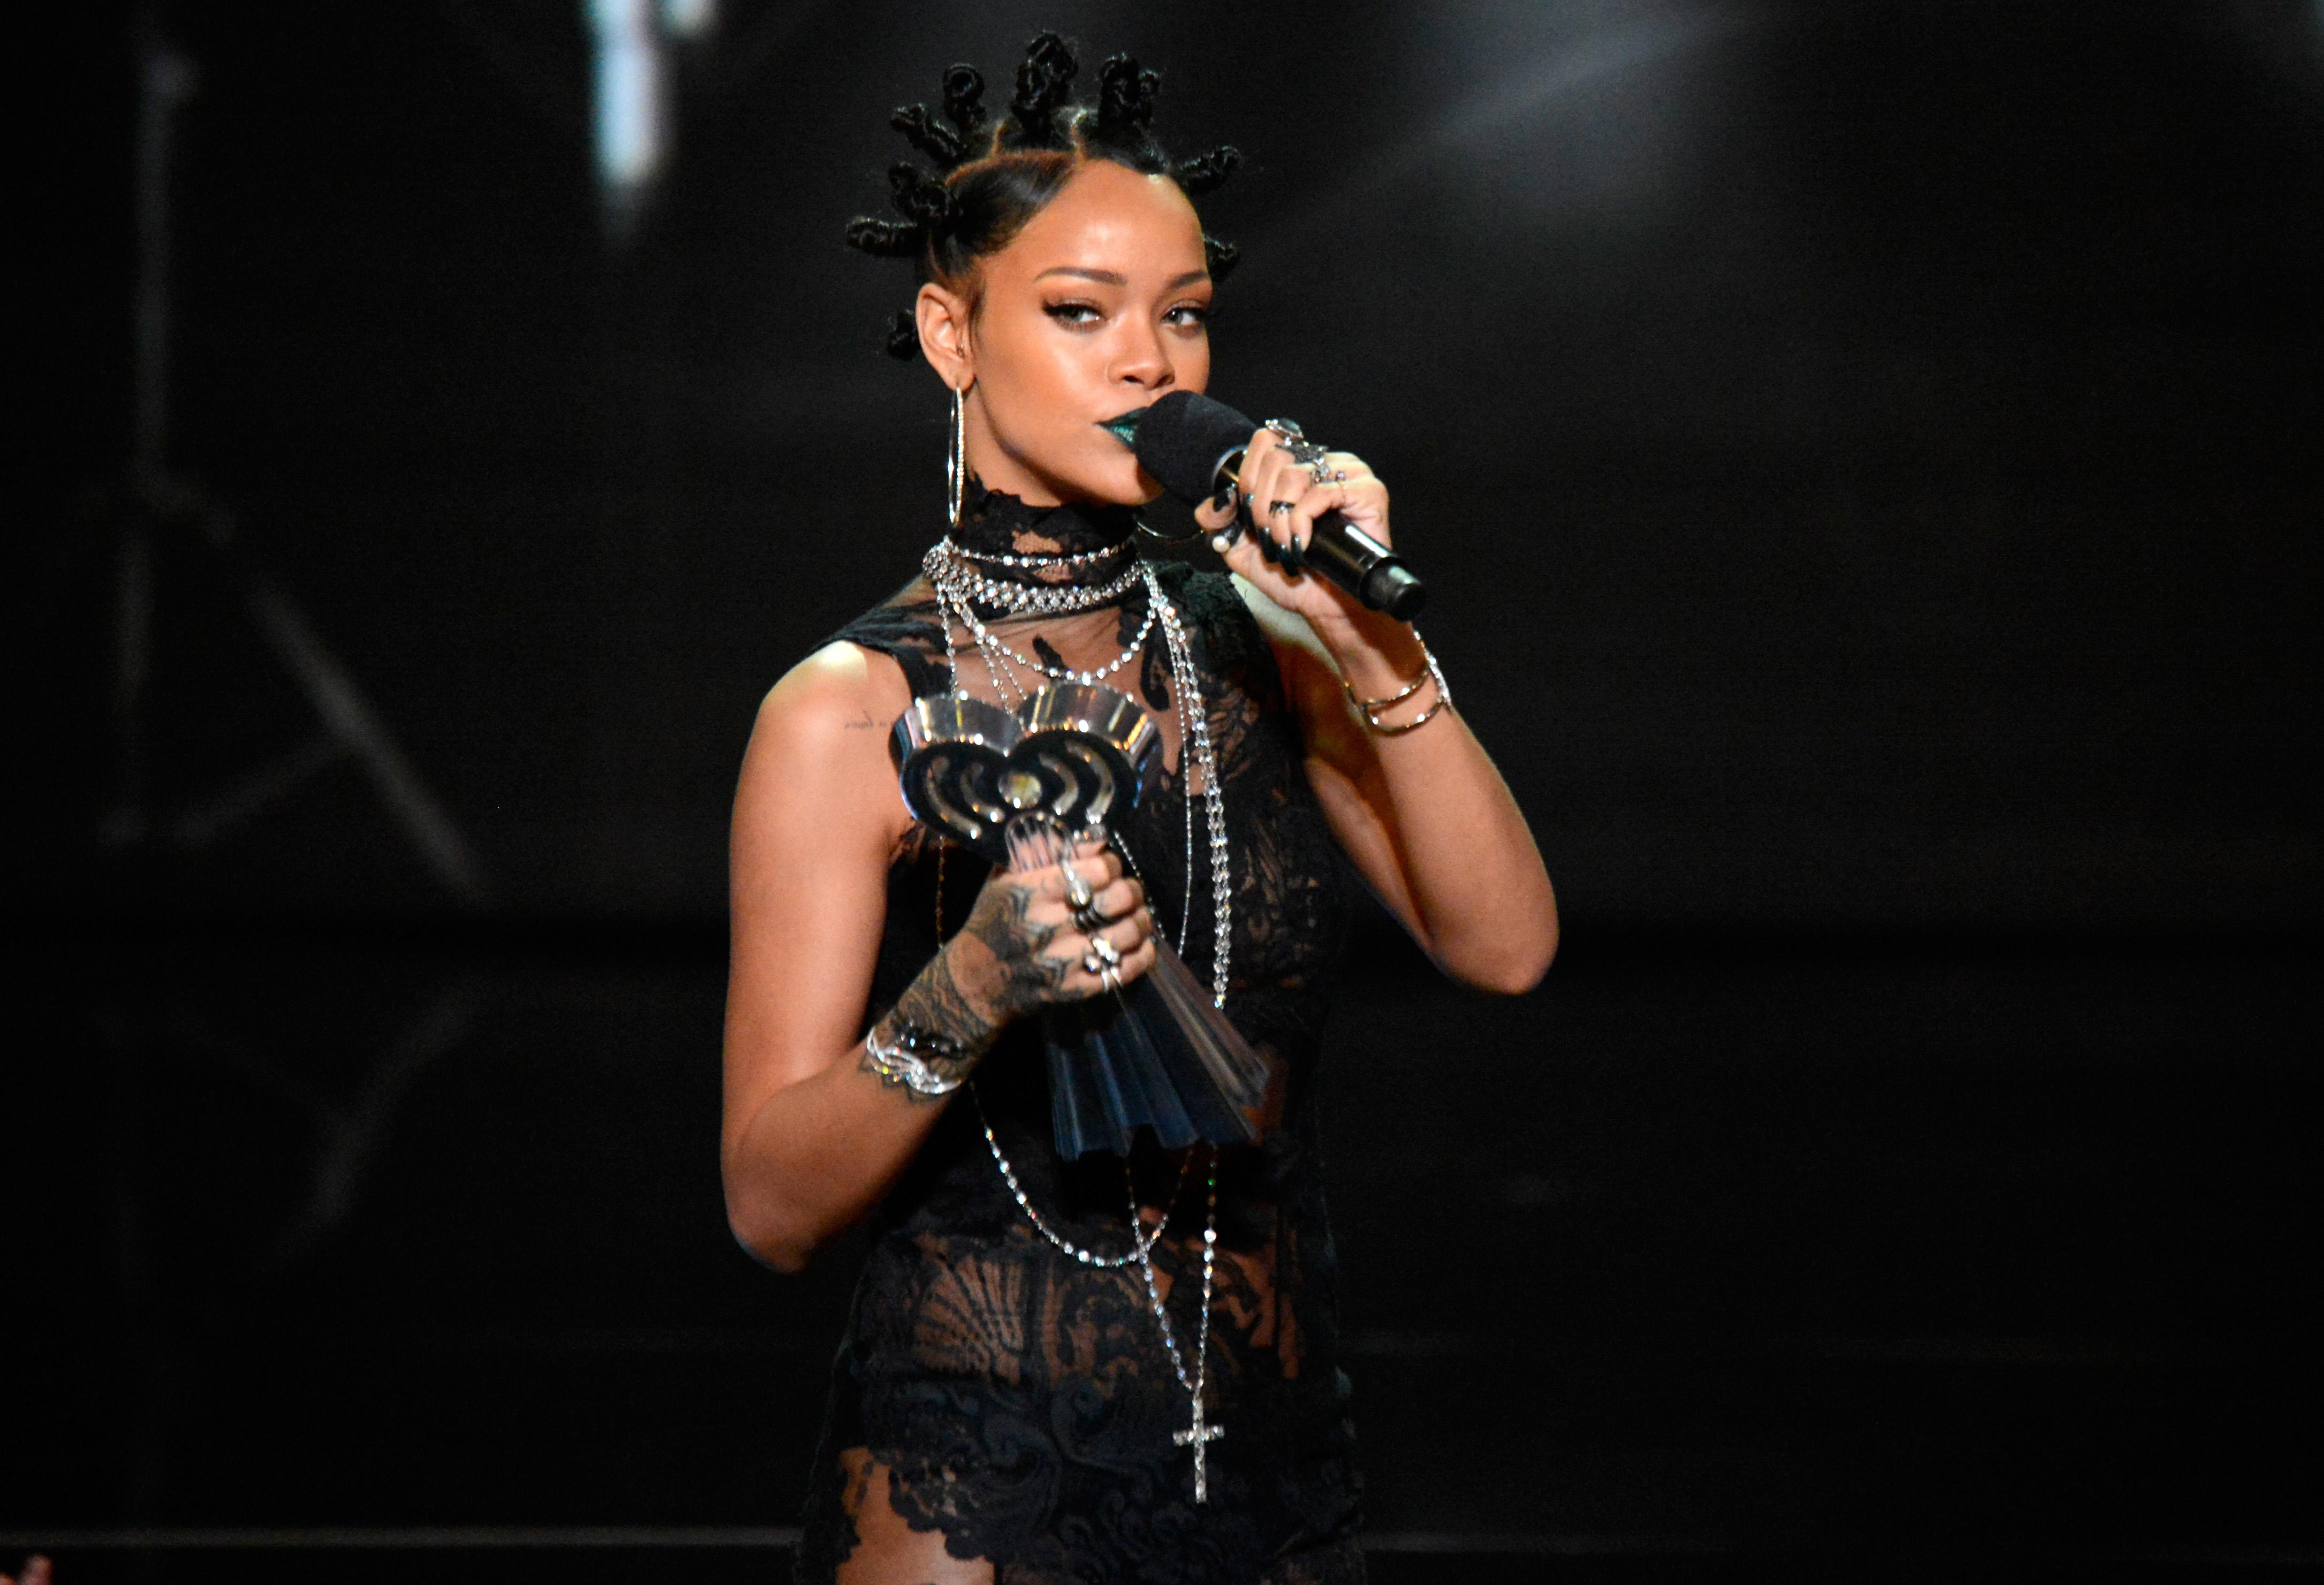 2014 iHeartRadio Music Awards - Show